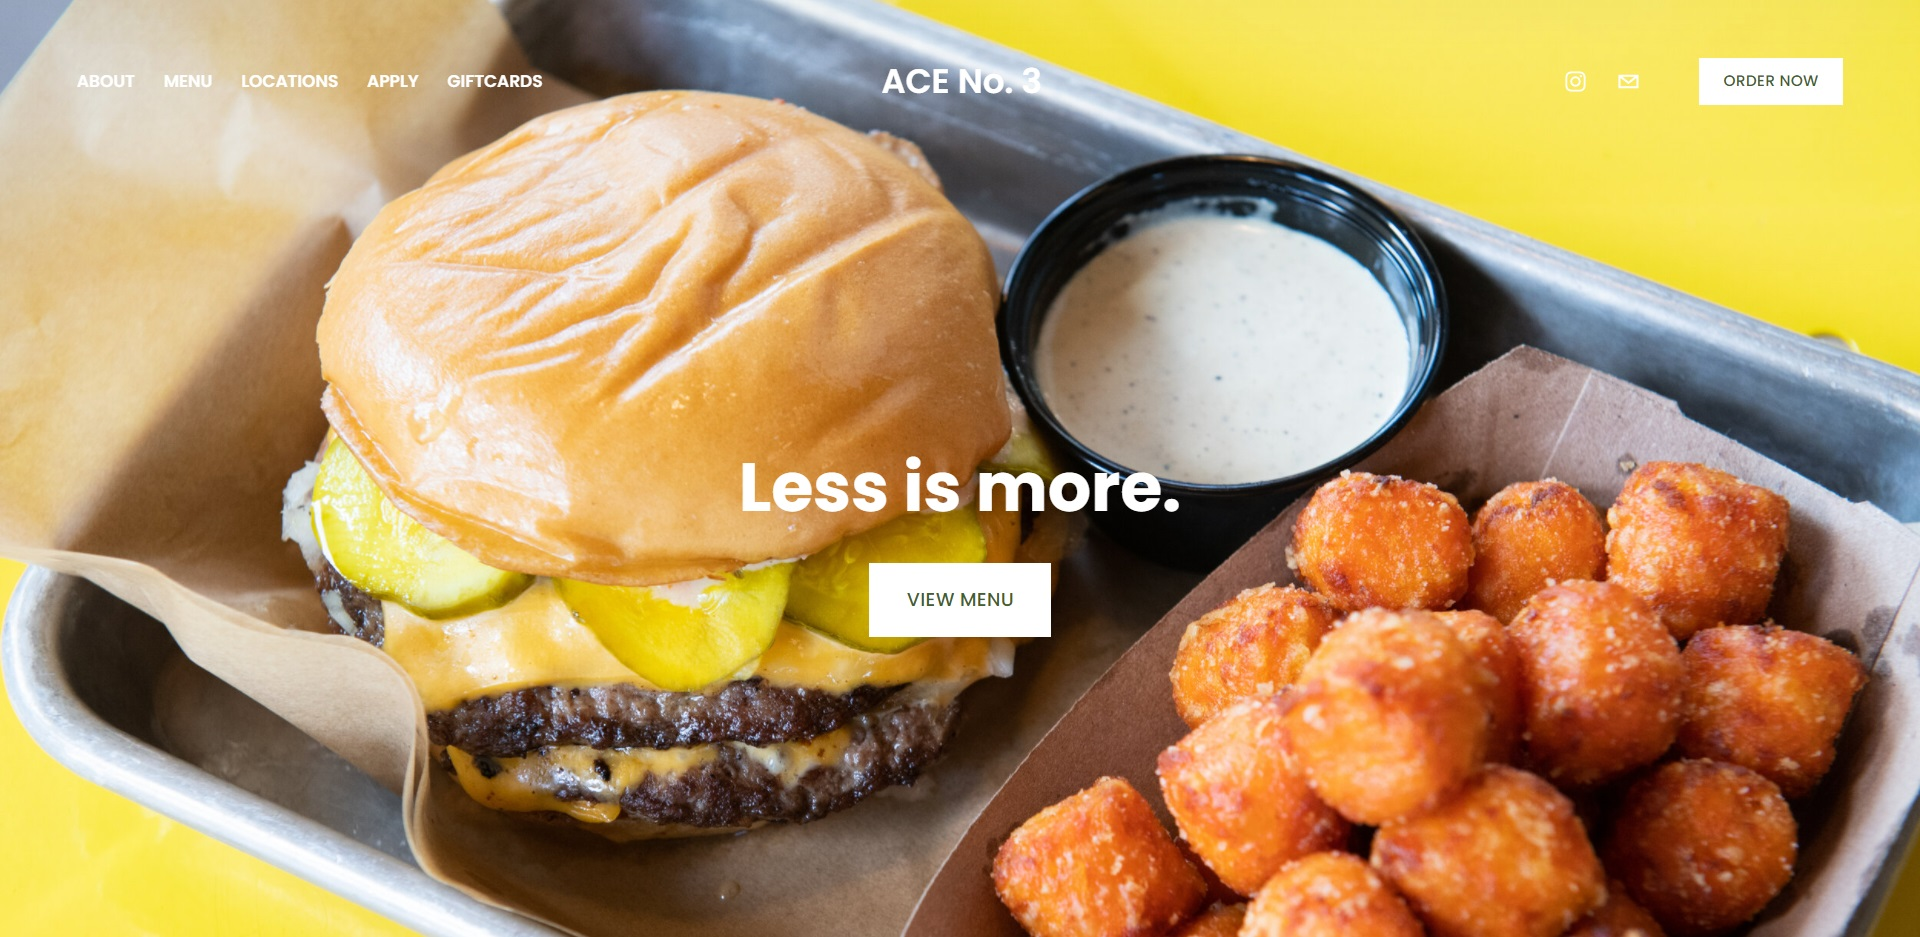 Best Delivery/takeaway Restaurants in Charlotte, NC